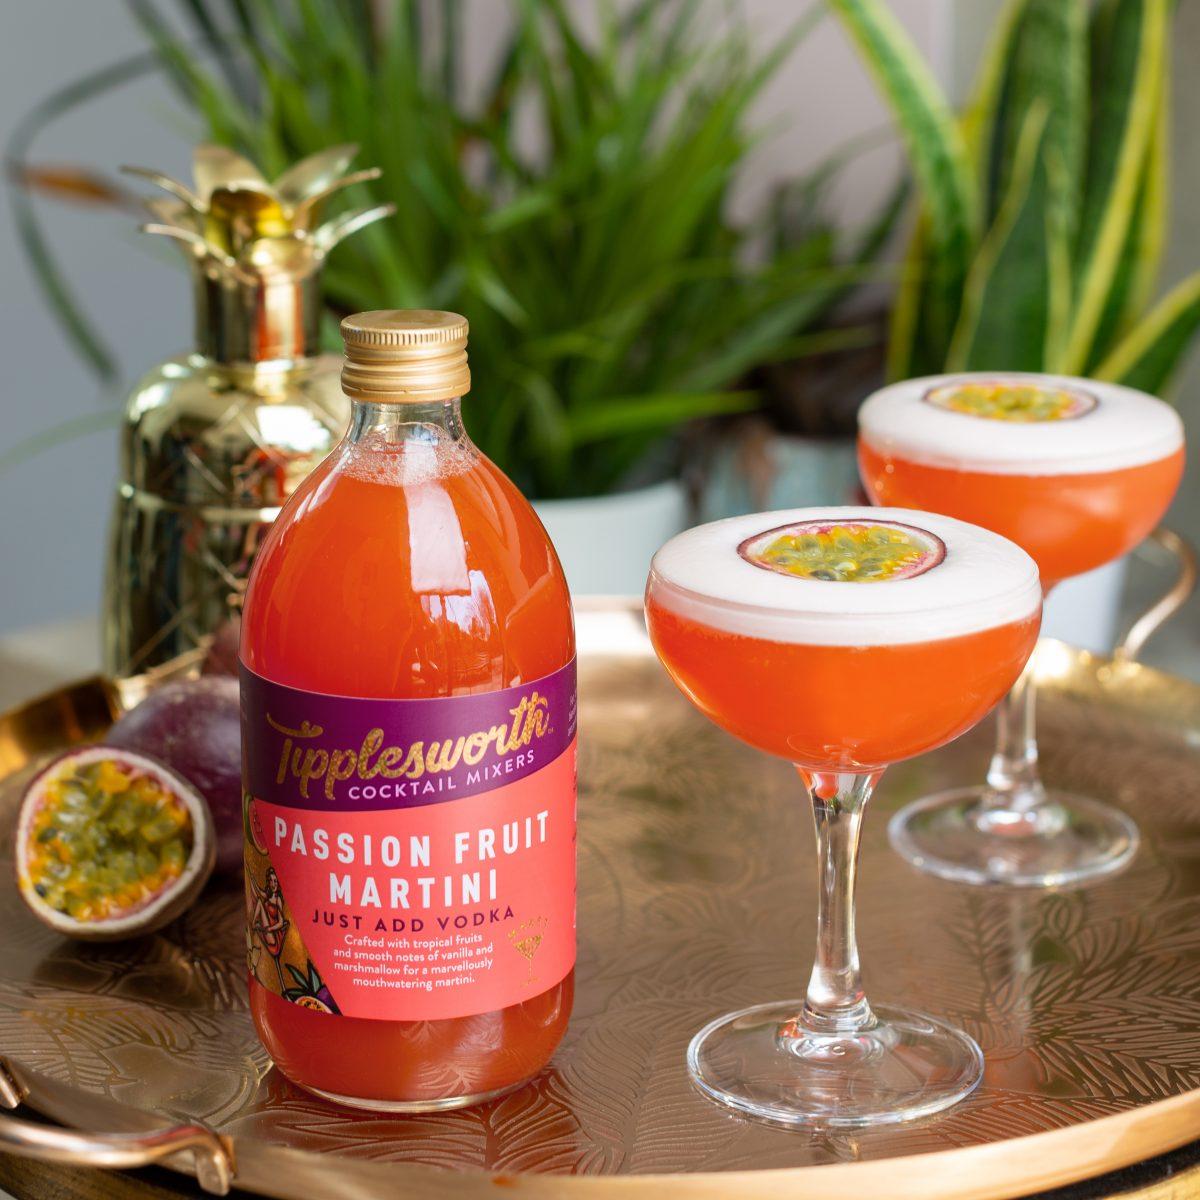 Top boozy festive drinks